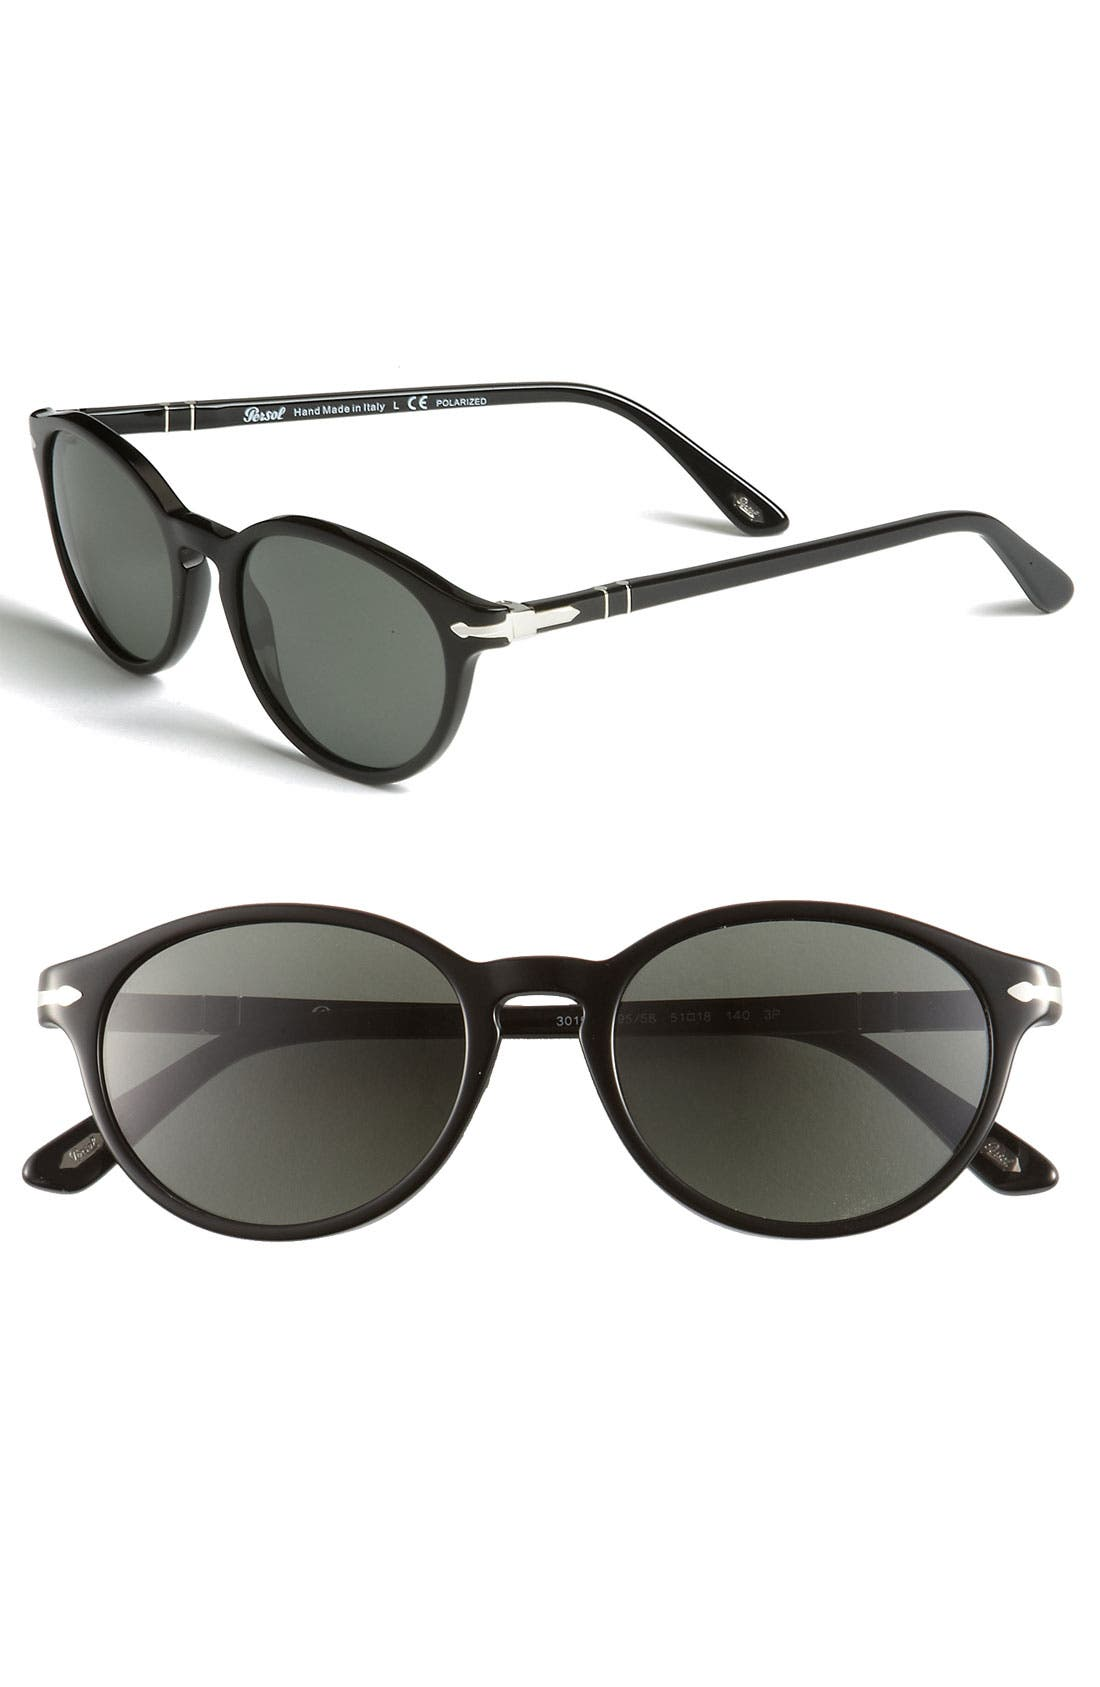 Alternate Image 1 Selected - Persol 51mm Polarized Keyhole Sunglasses